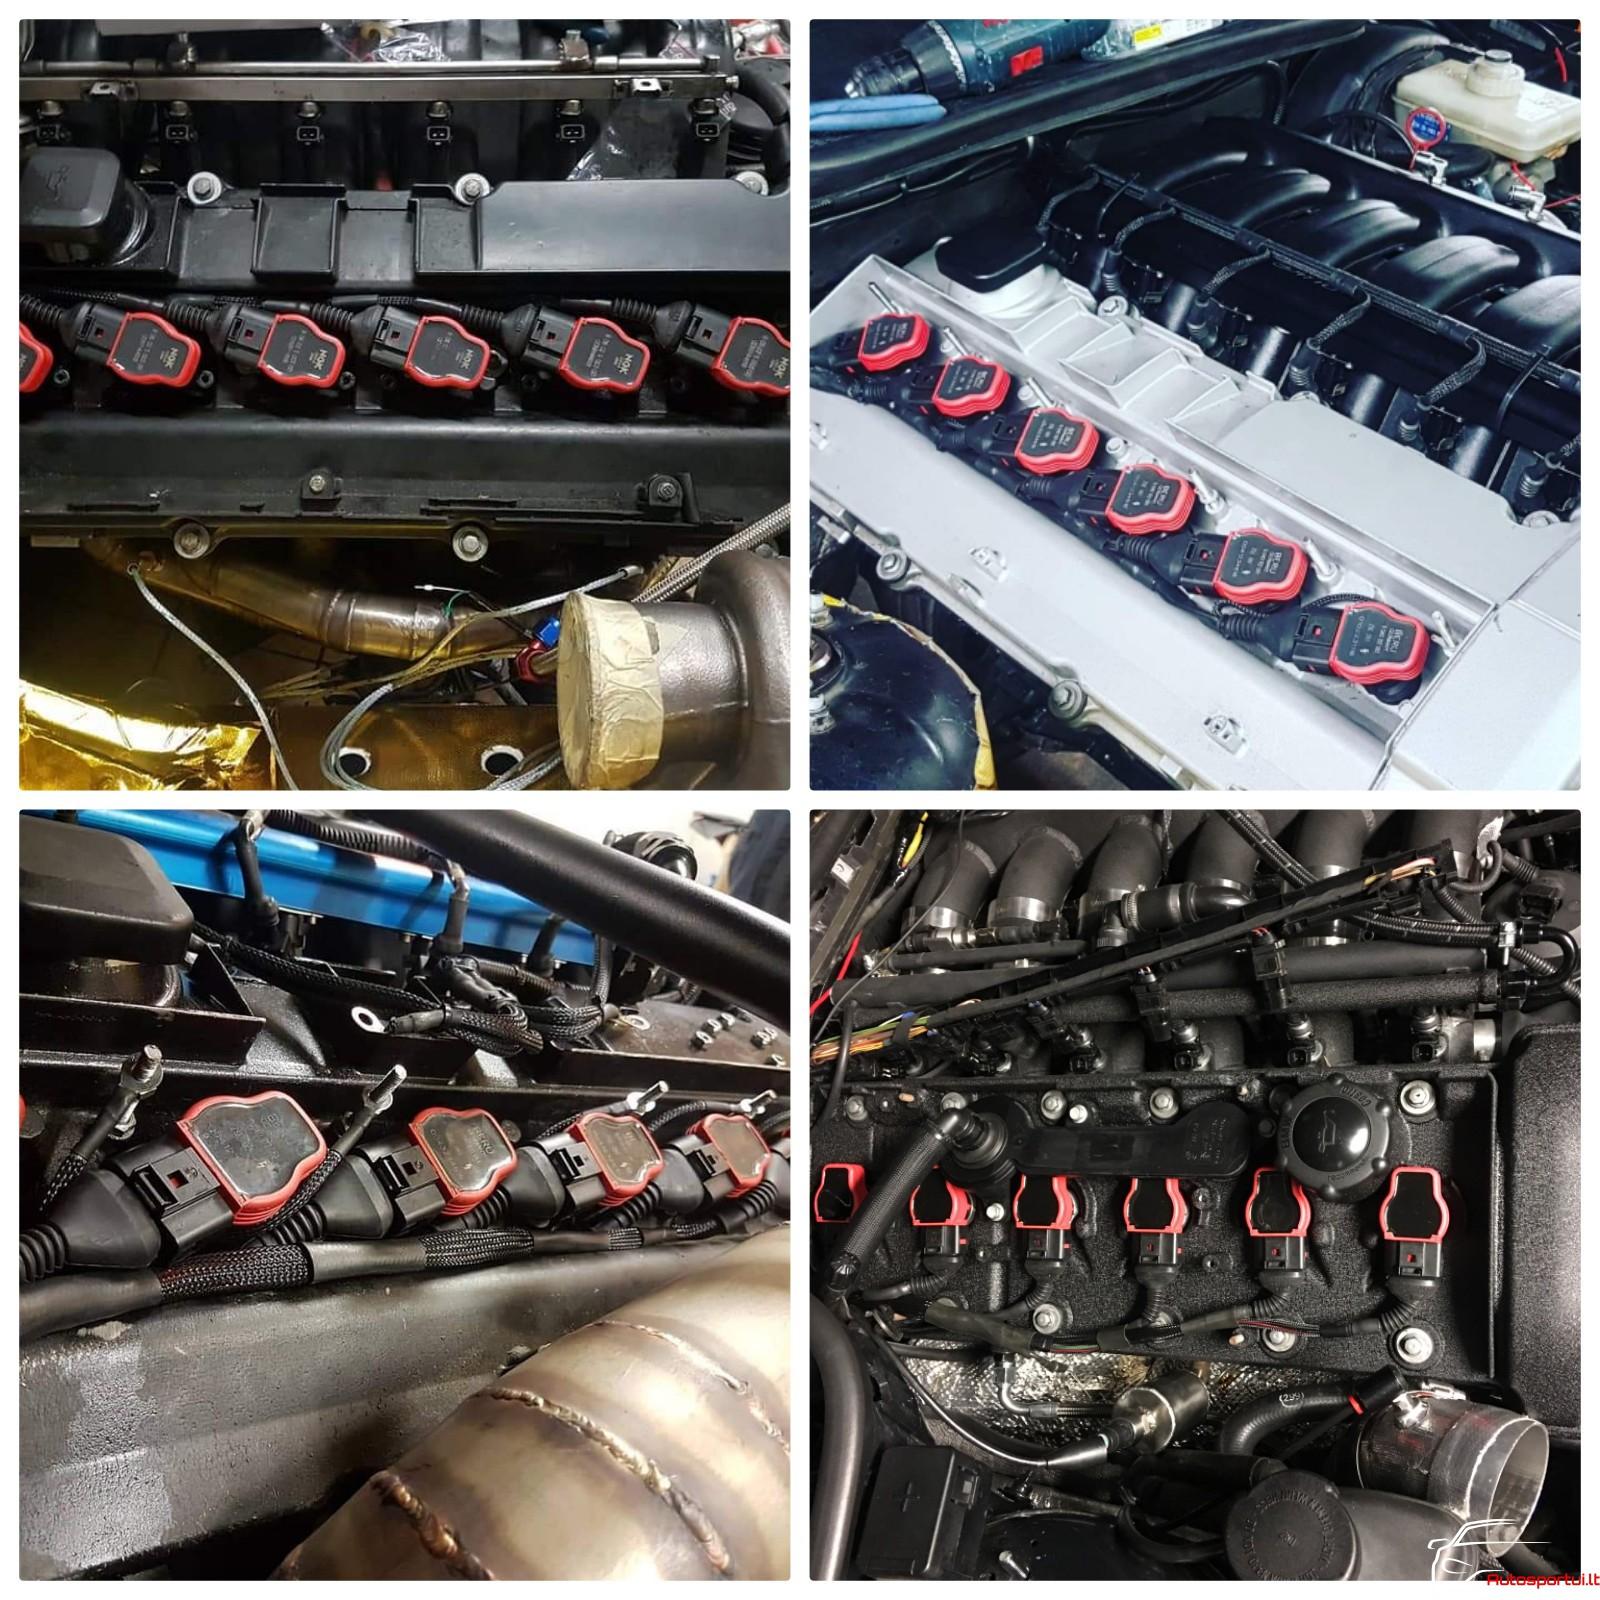 M50b25 motorsport wiring with VAG